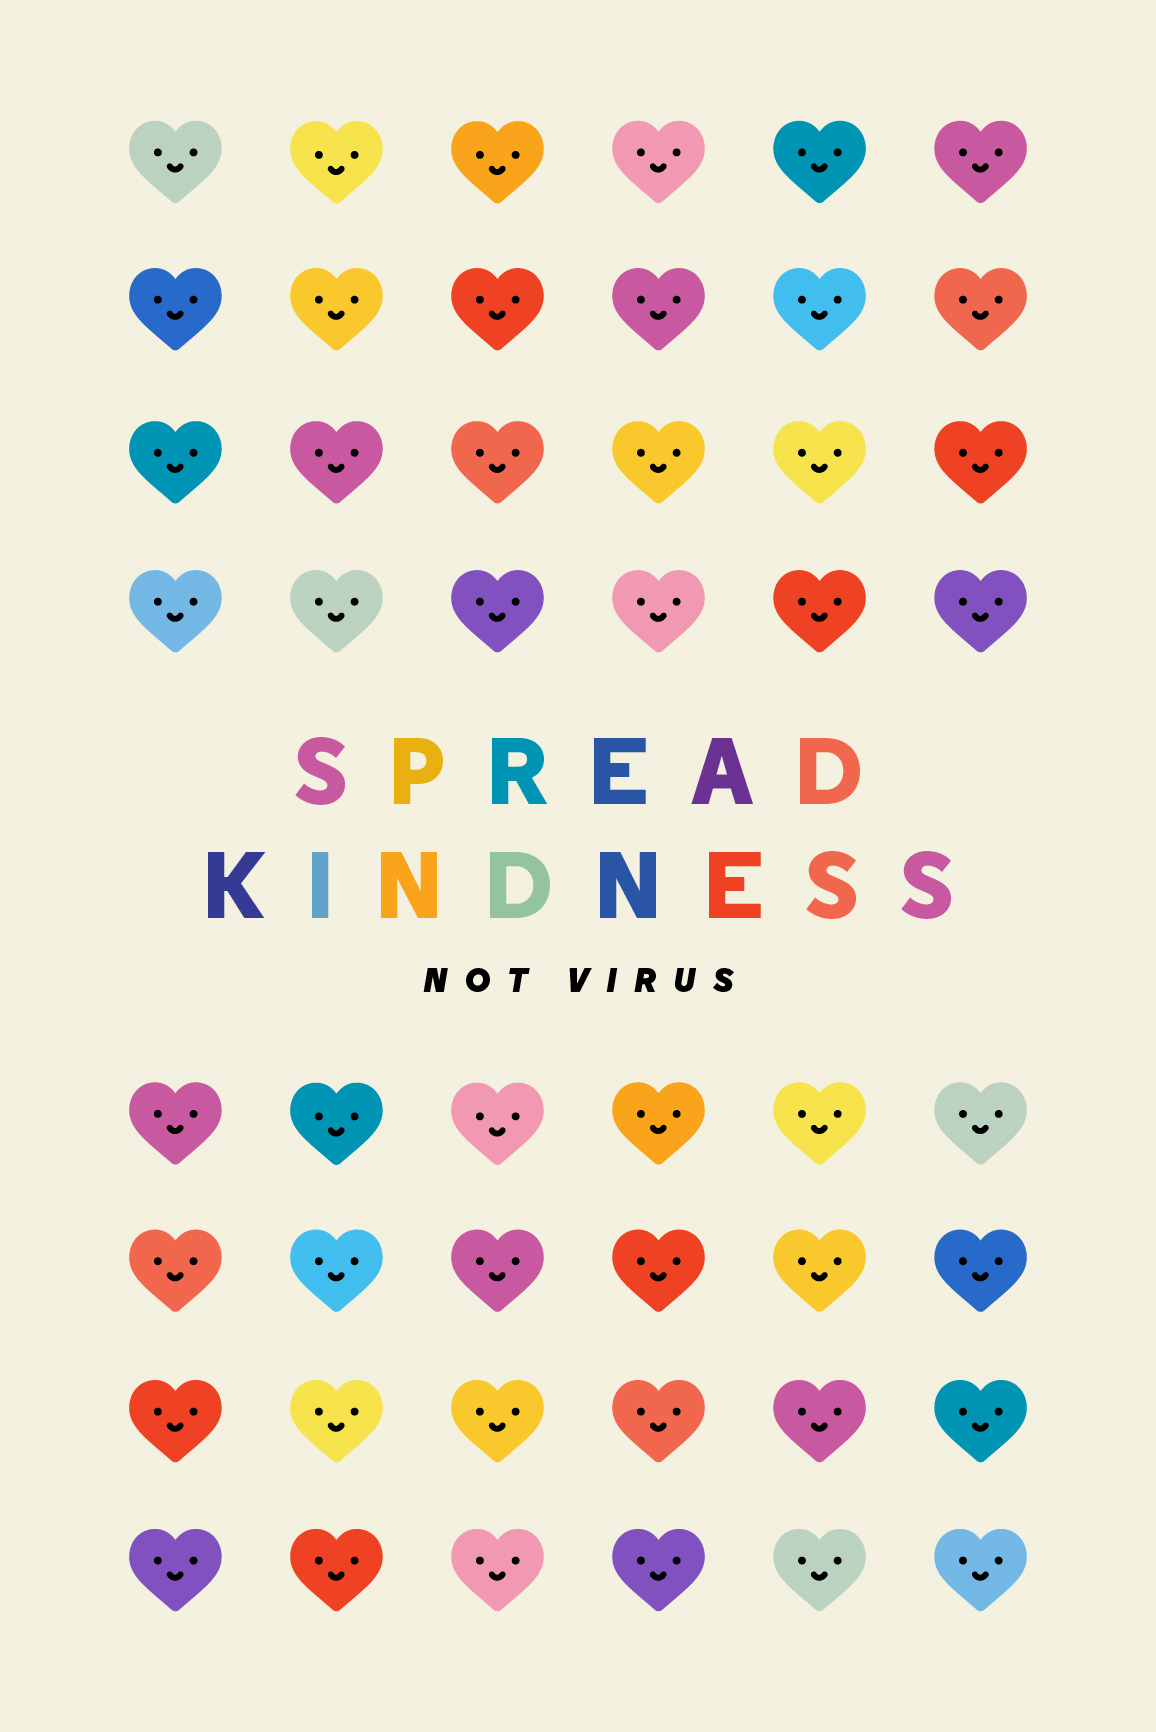 Spread Kindness Not Virus